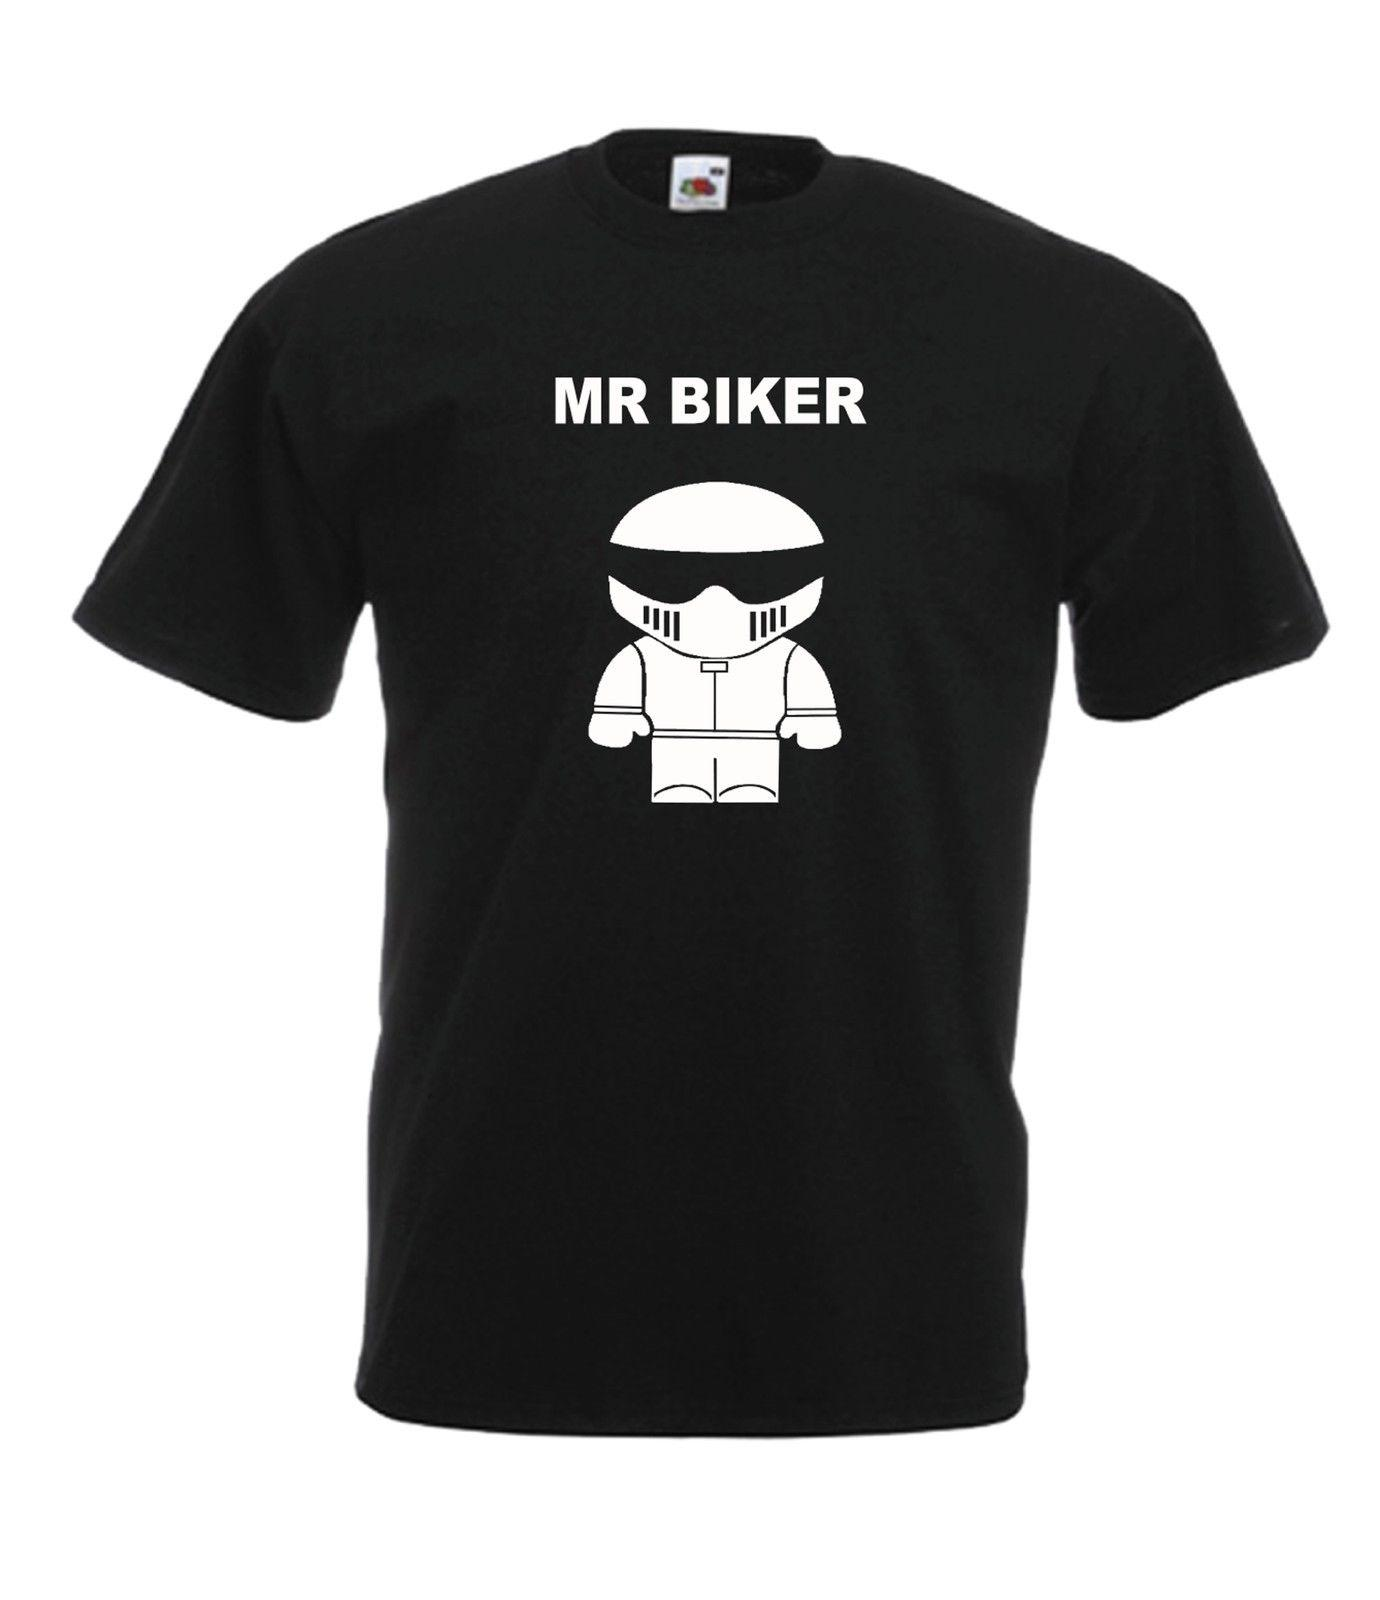 MR BIKER Funny Biker Motor Bike Xmas Birthday Gift Ideas Mens Womens T SHIRT TOP Fun Shirt Buy Online Shirts From Populartees 1101